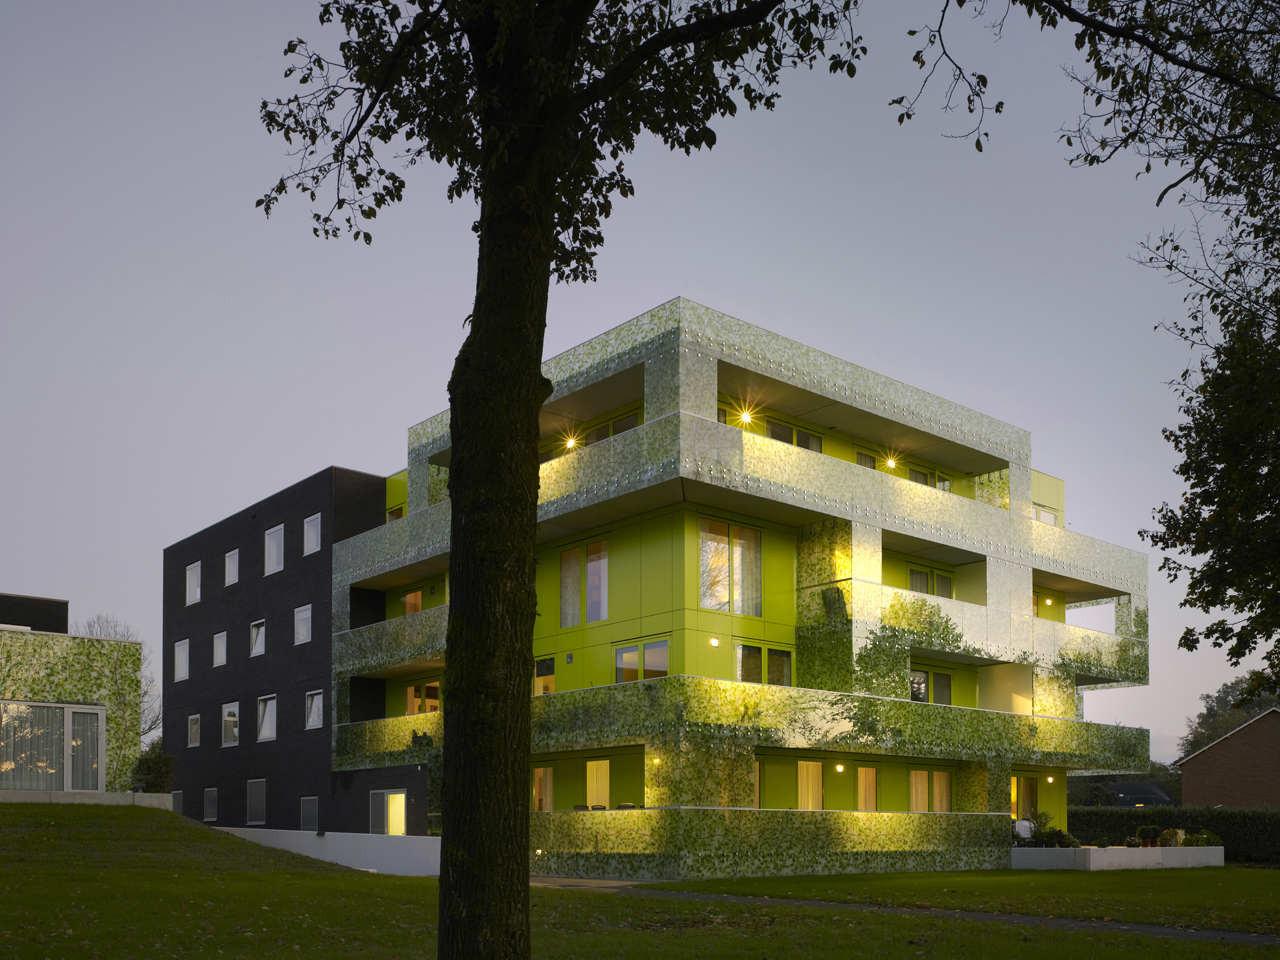 Gingko Project / Casanova + Hernandez Architects, © Christian Richters